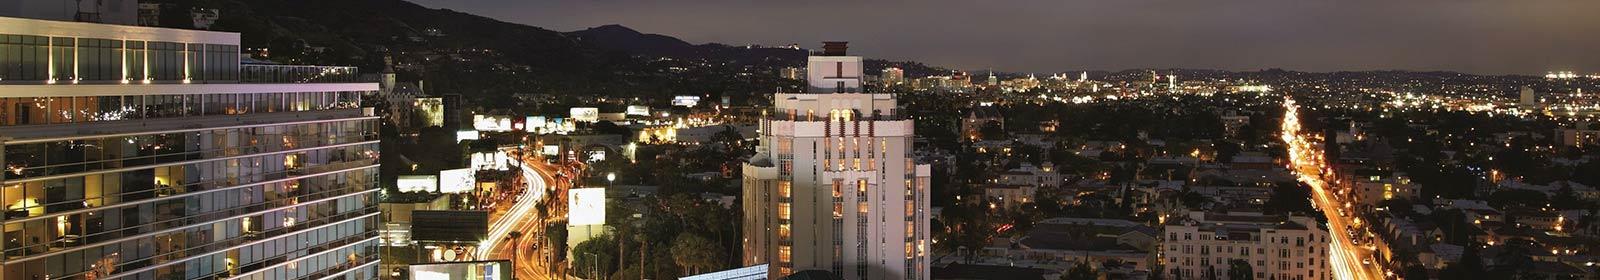 Image of city skyline at night